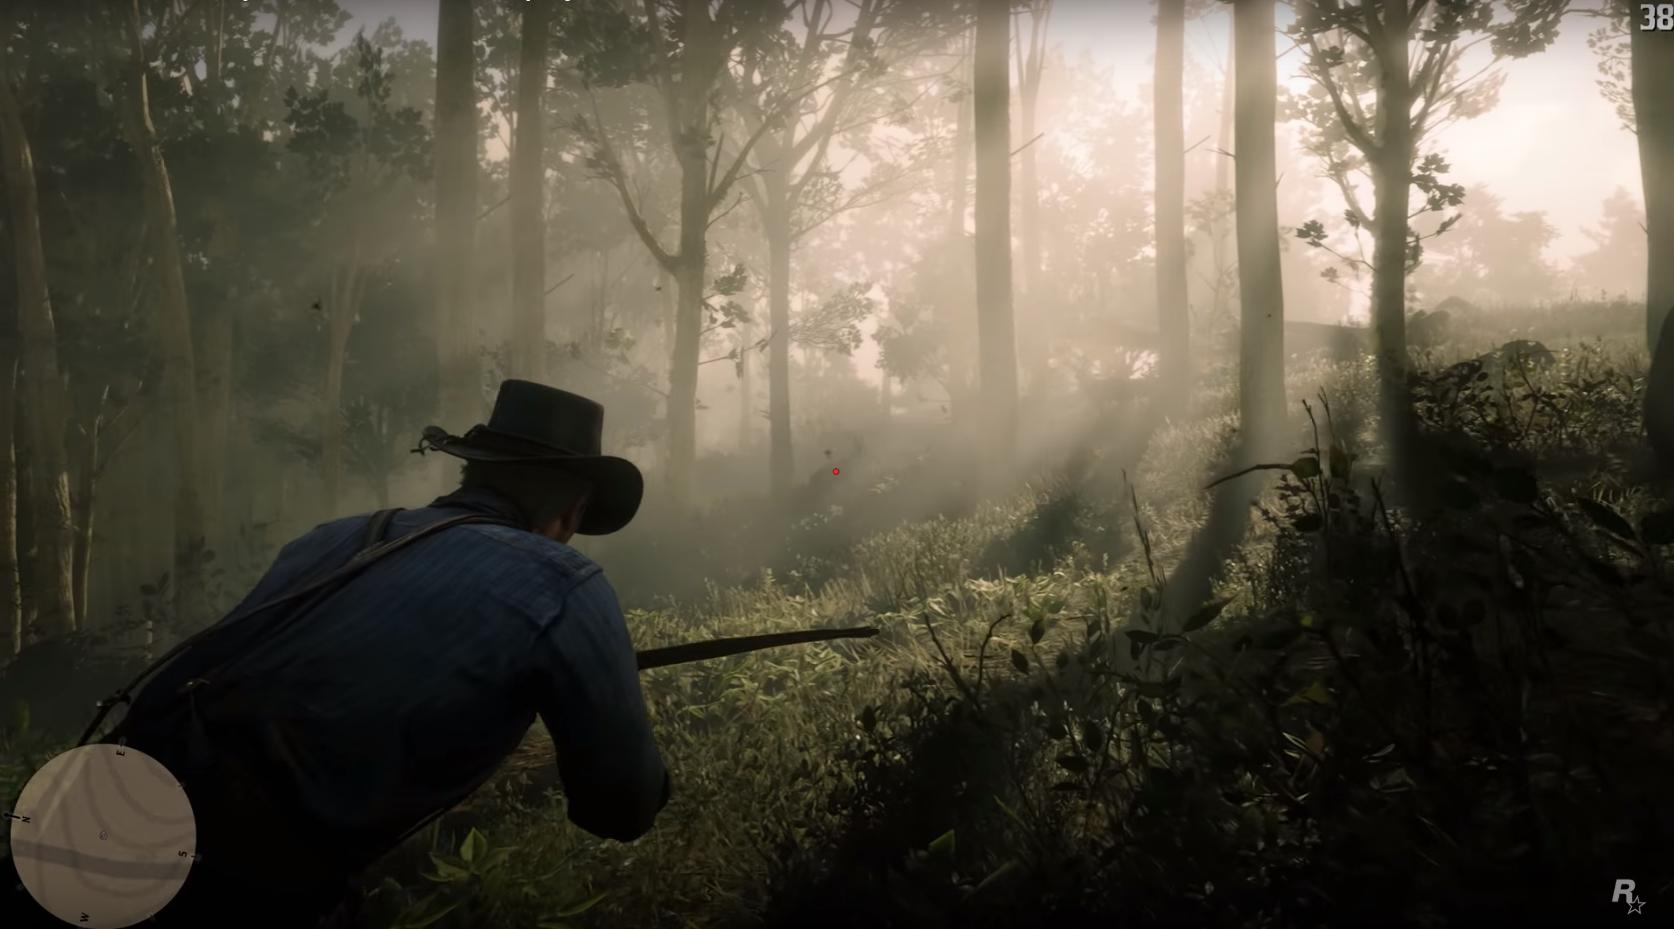 Red Dead Redemption 2: dissecamos todos os detalhes do gameplay; confira